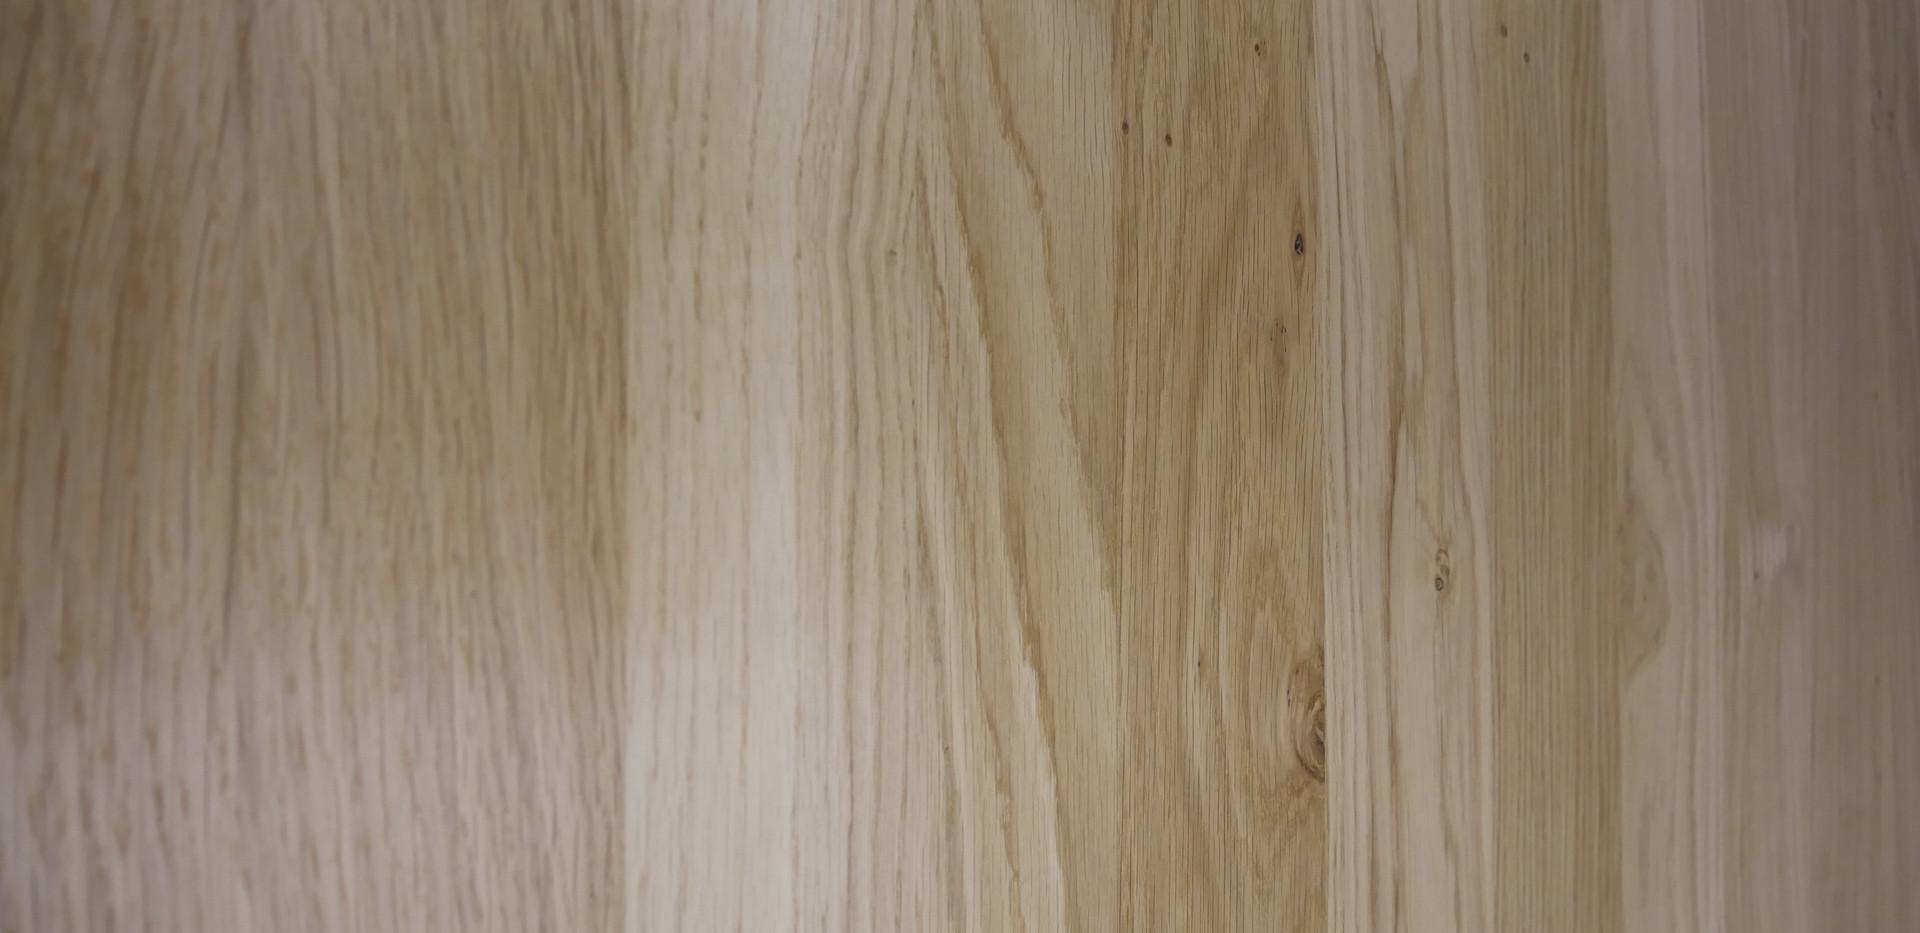 Morlaix wood.jpg